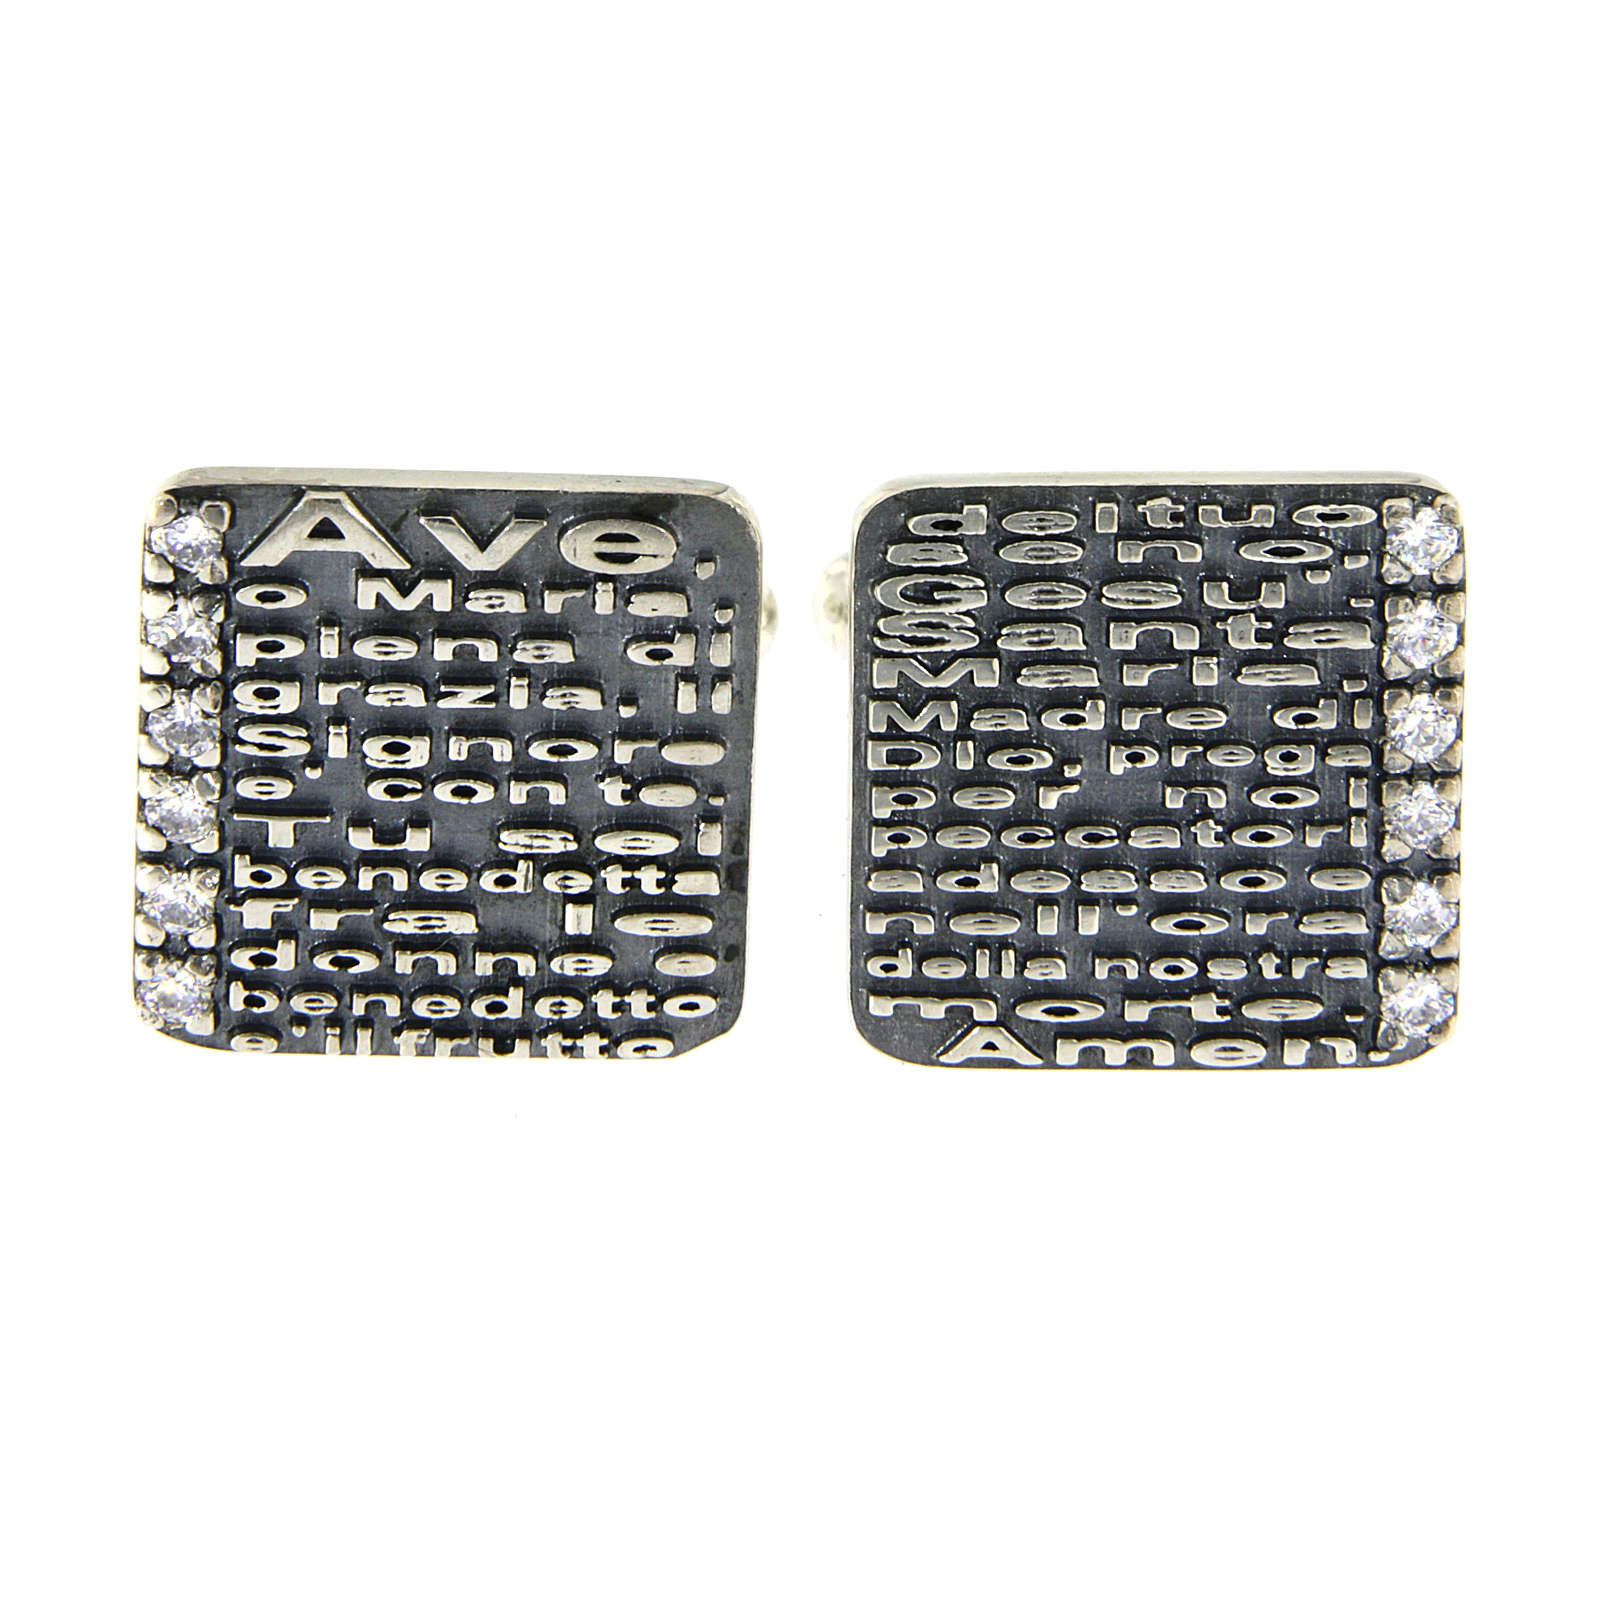 Hail Mary prayer AMEN cufflinks, 925 sterling silver and zircons 4